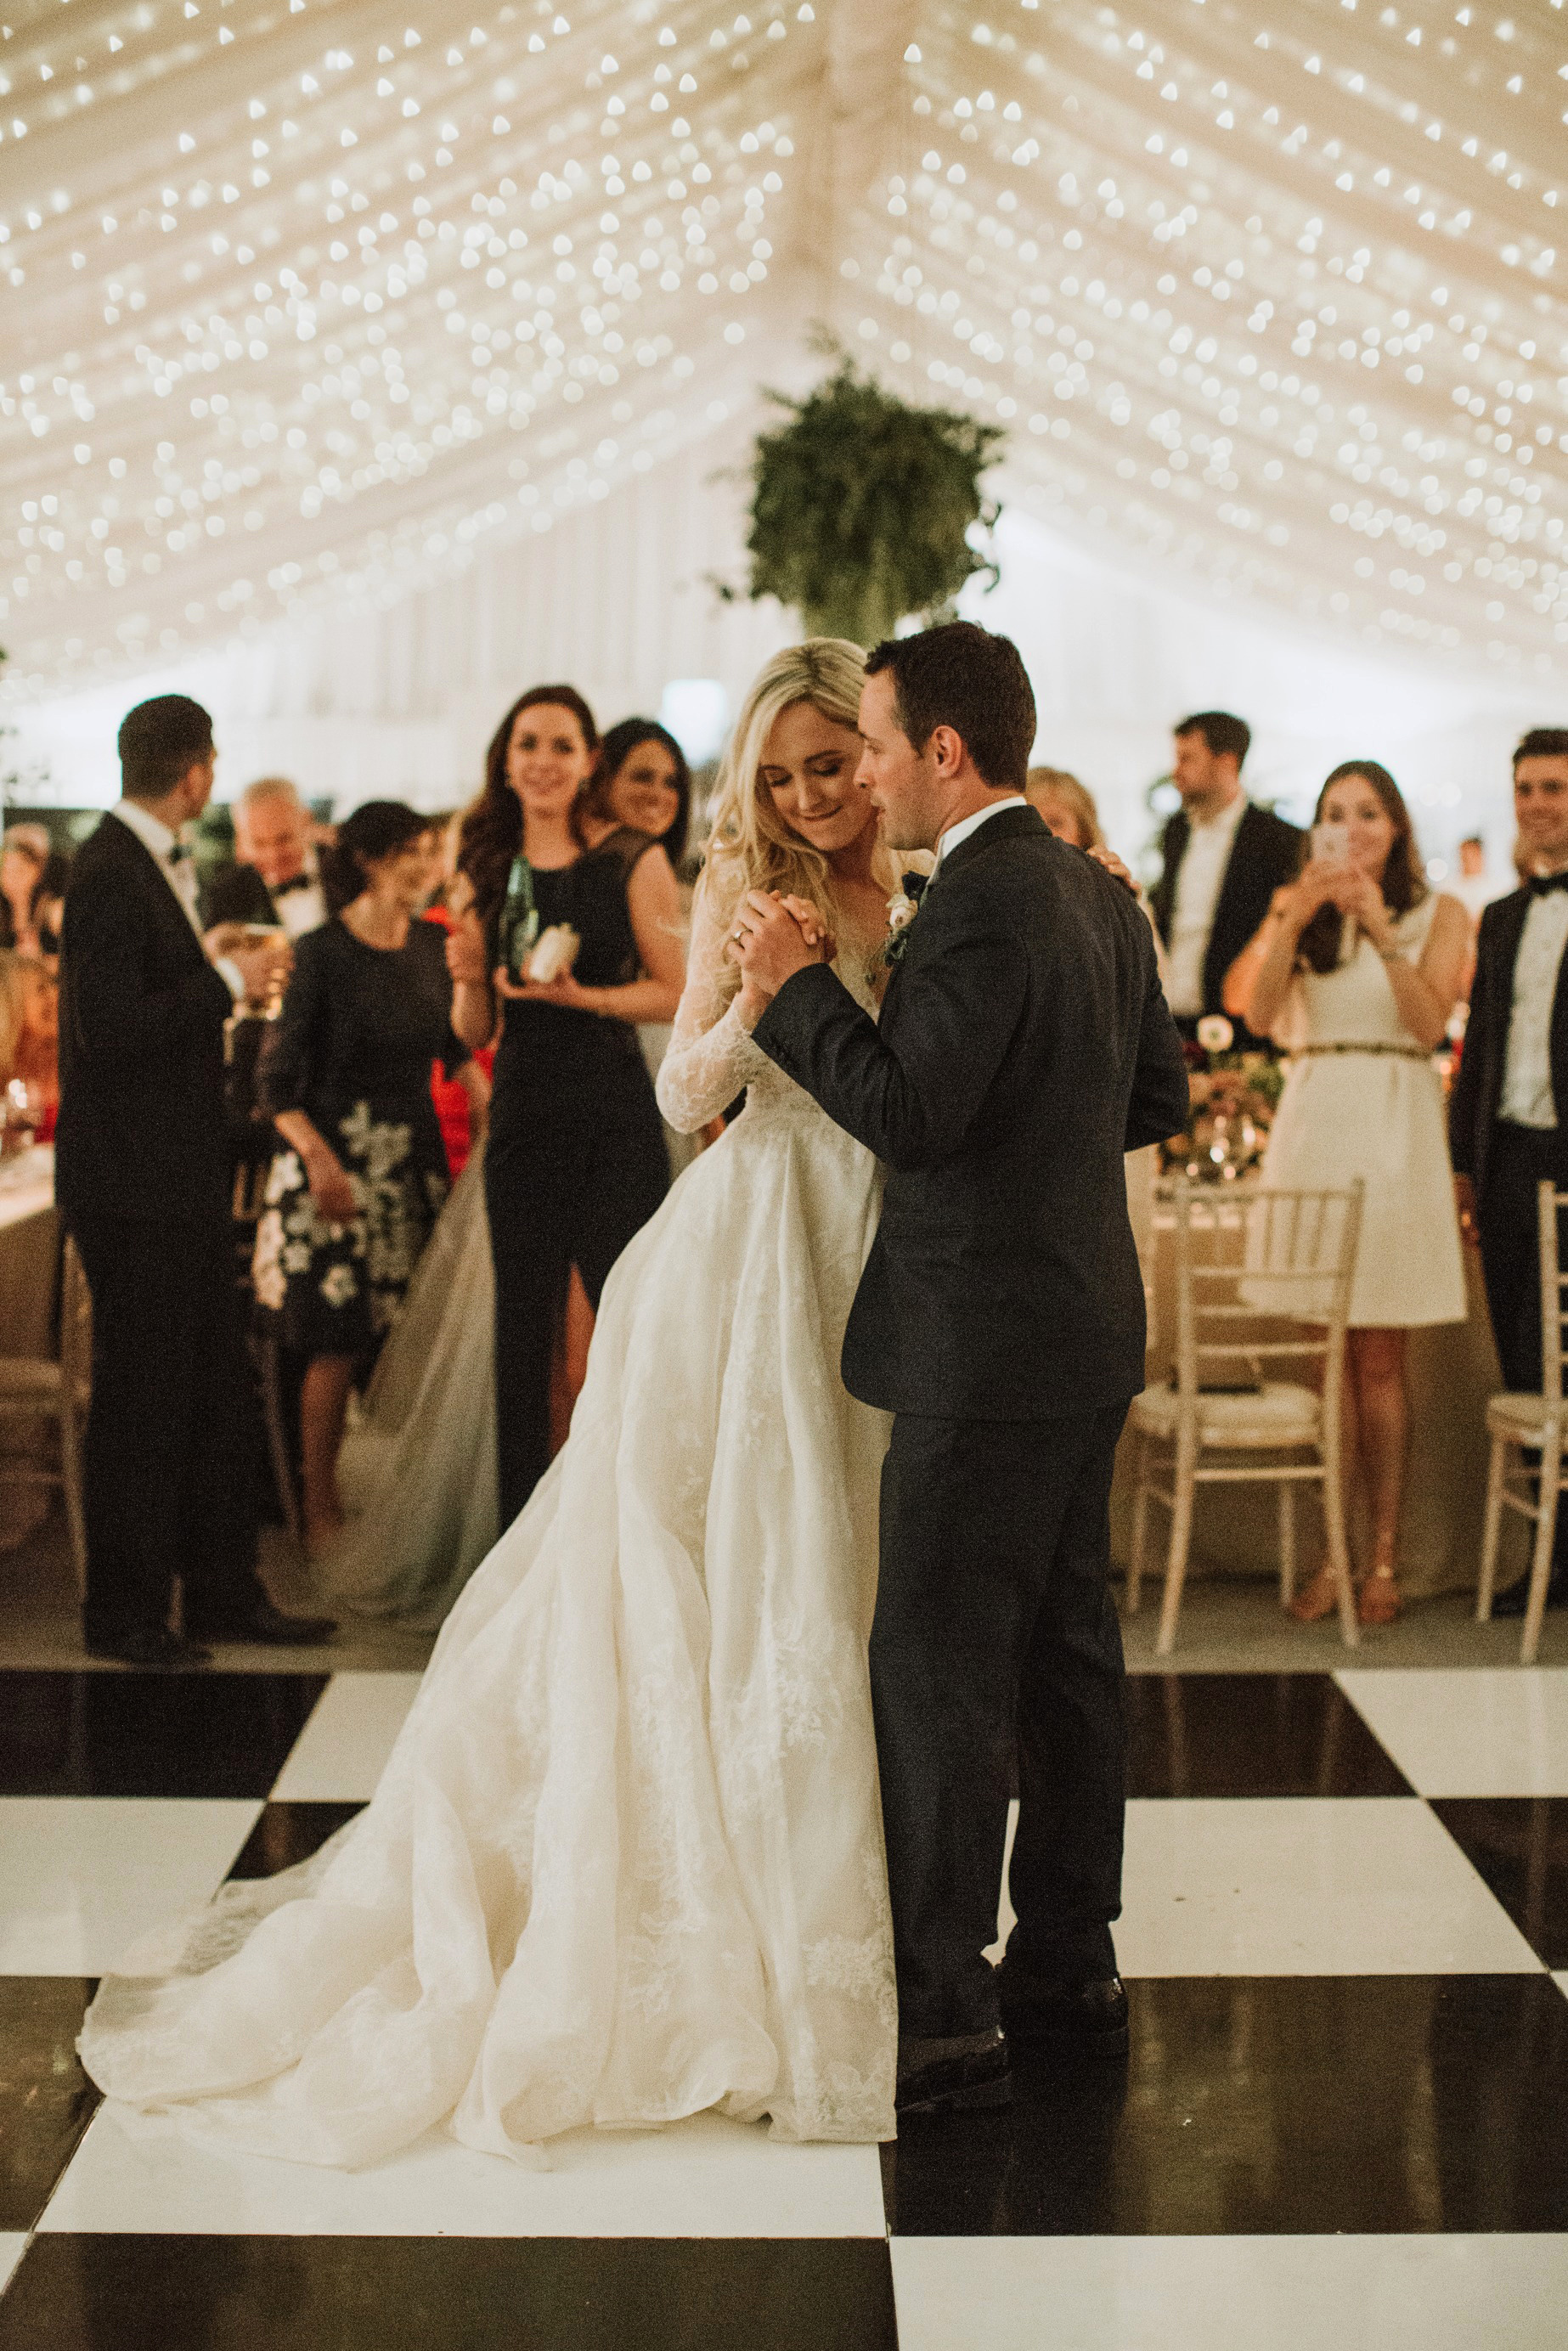 simone darren wedding ireland first dance